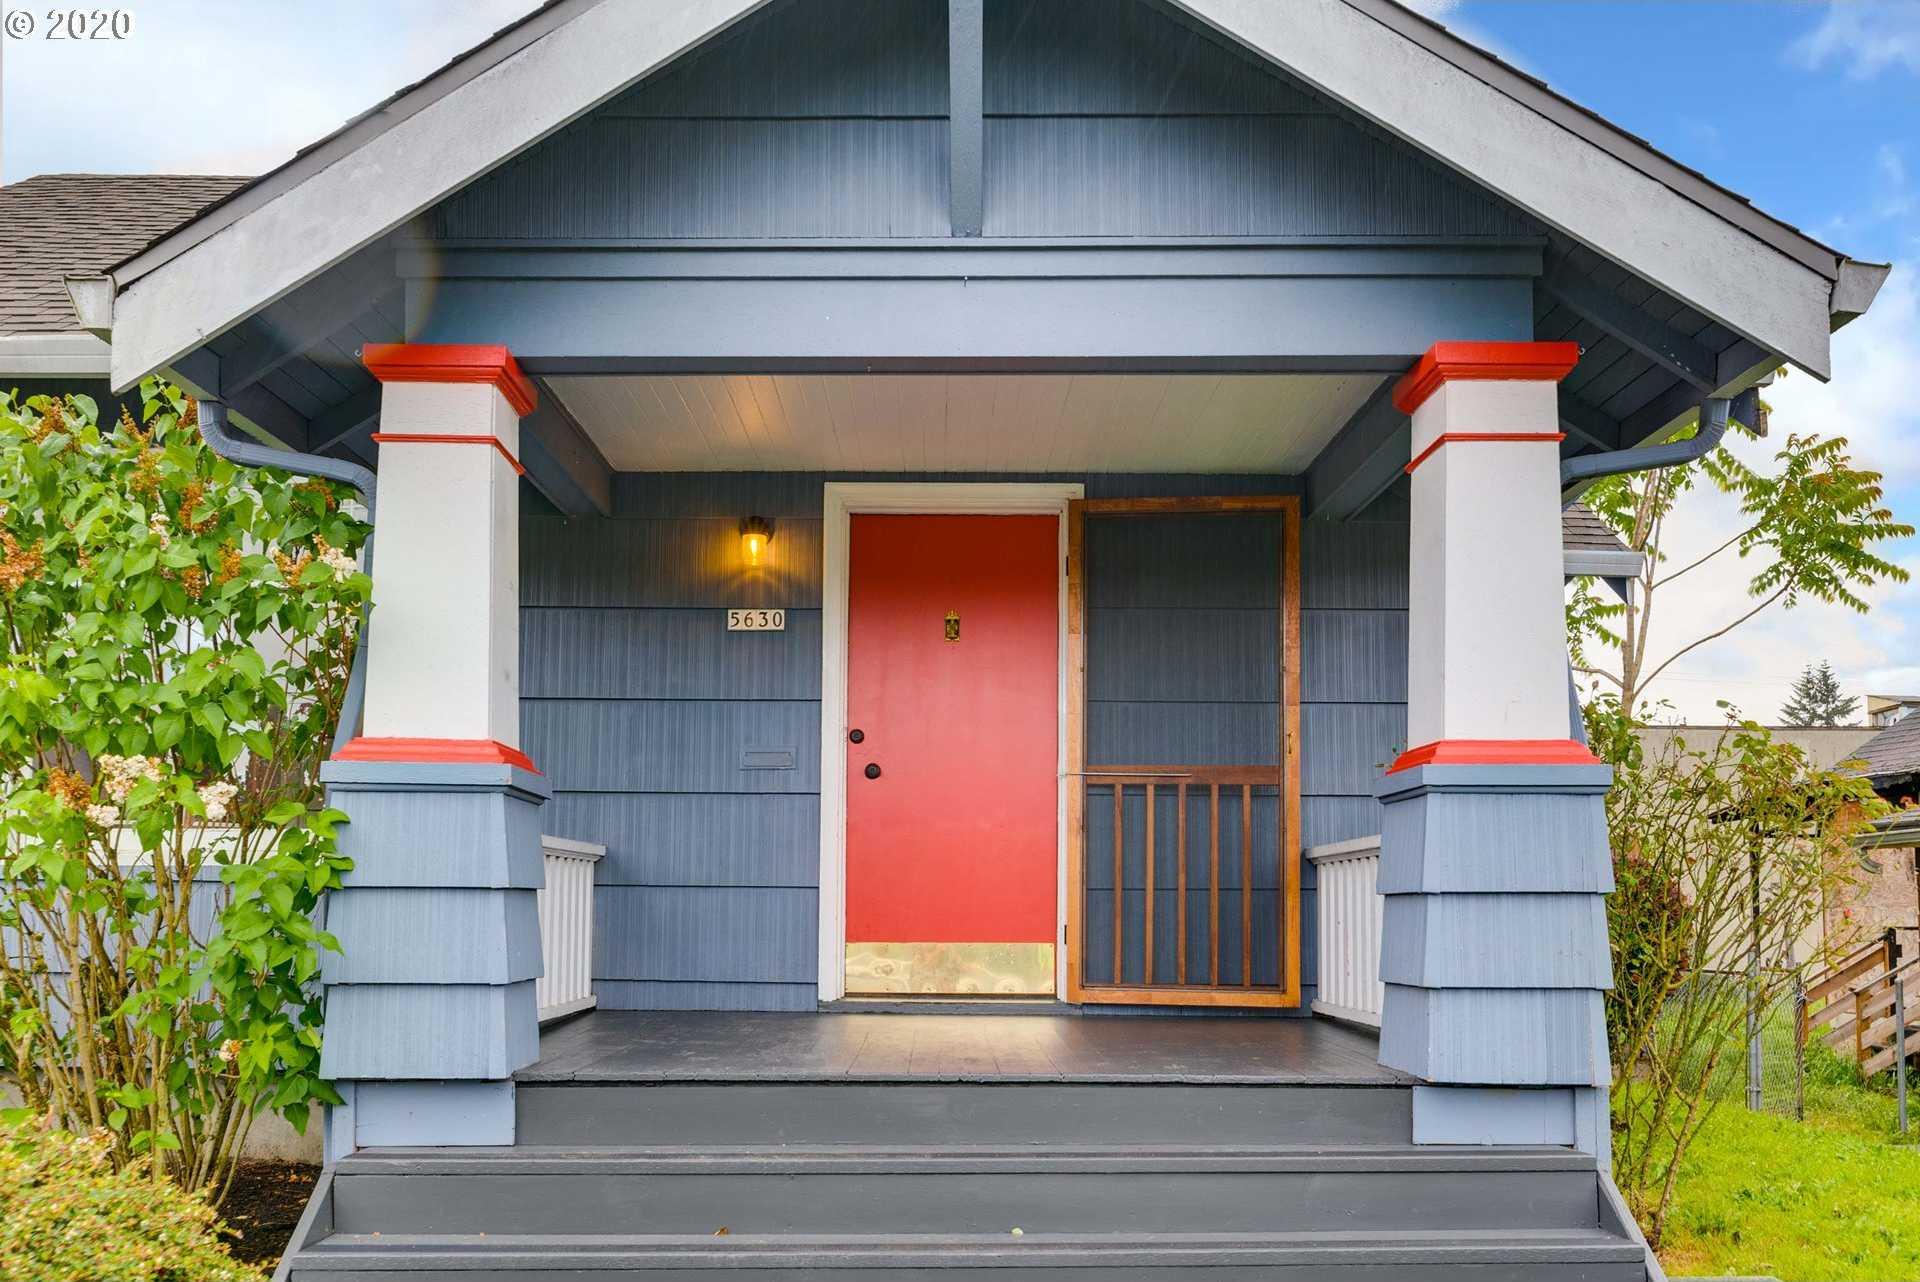 $329,000 - 2Br/1Ba - for Sale in Foster - Powell, Portland